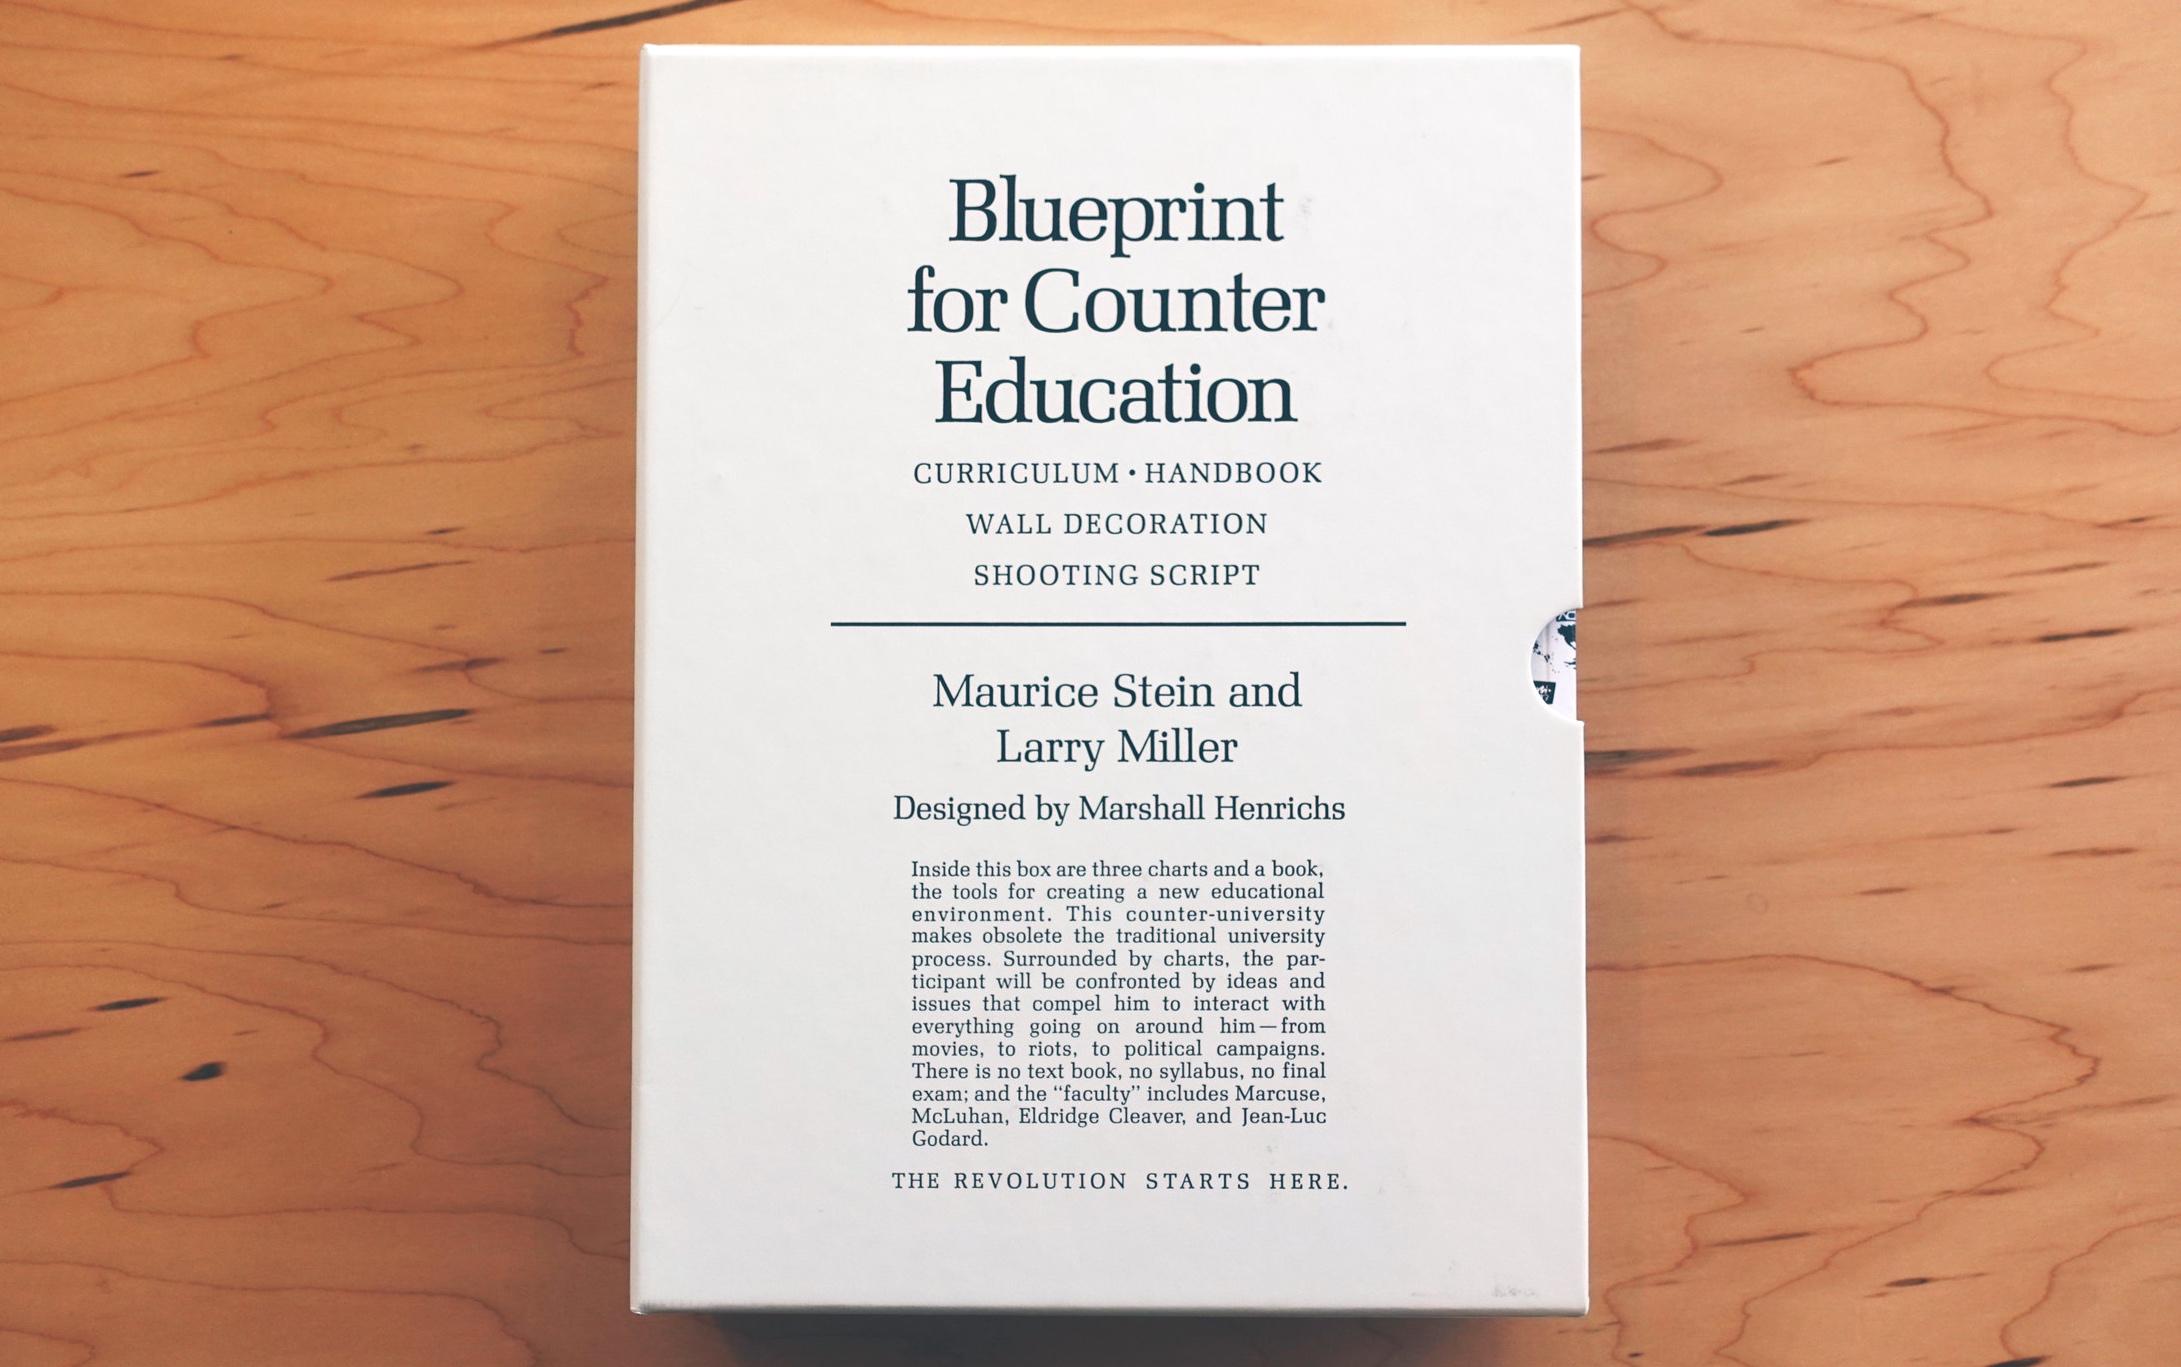 Corporate Mentality, John Kelsey and Aleksandra Mir, eds. (New York: Lucas and Sternberg, 2003)